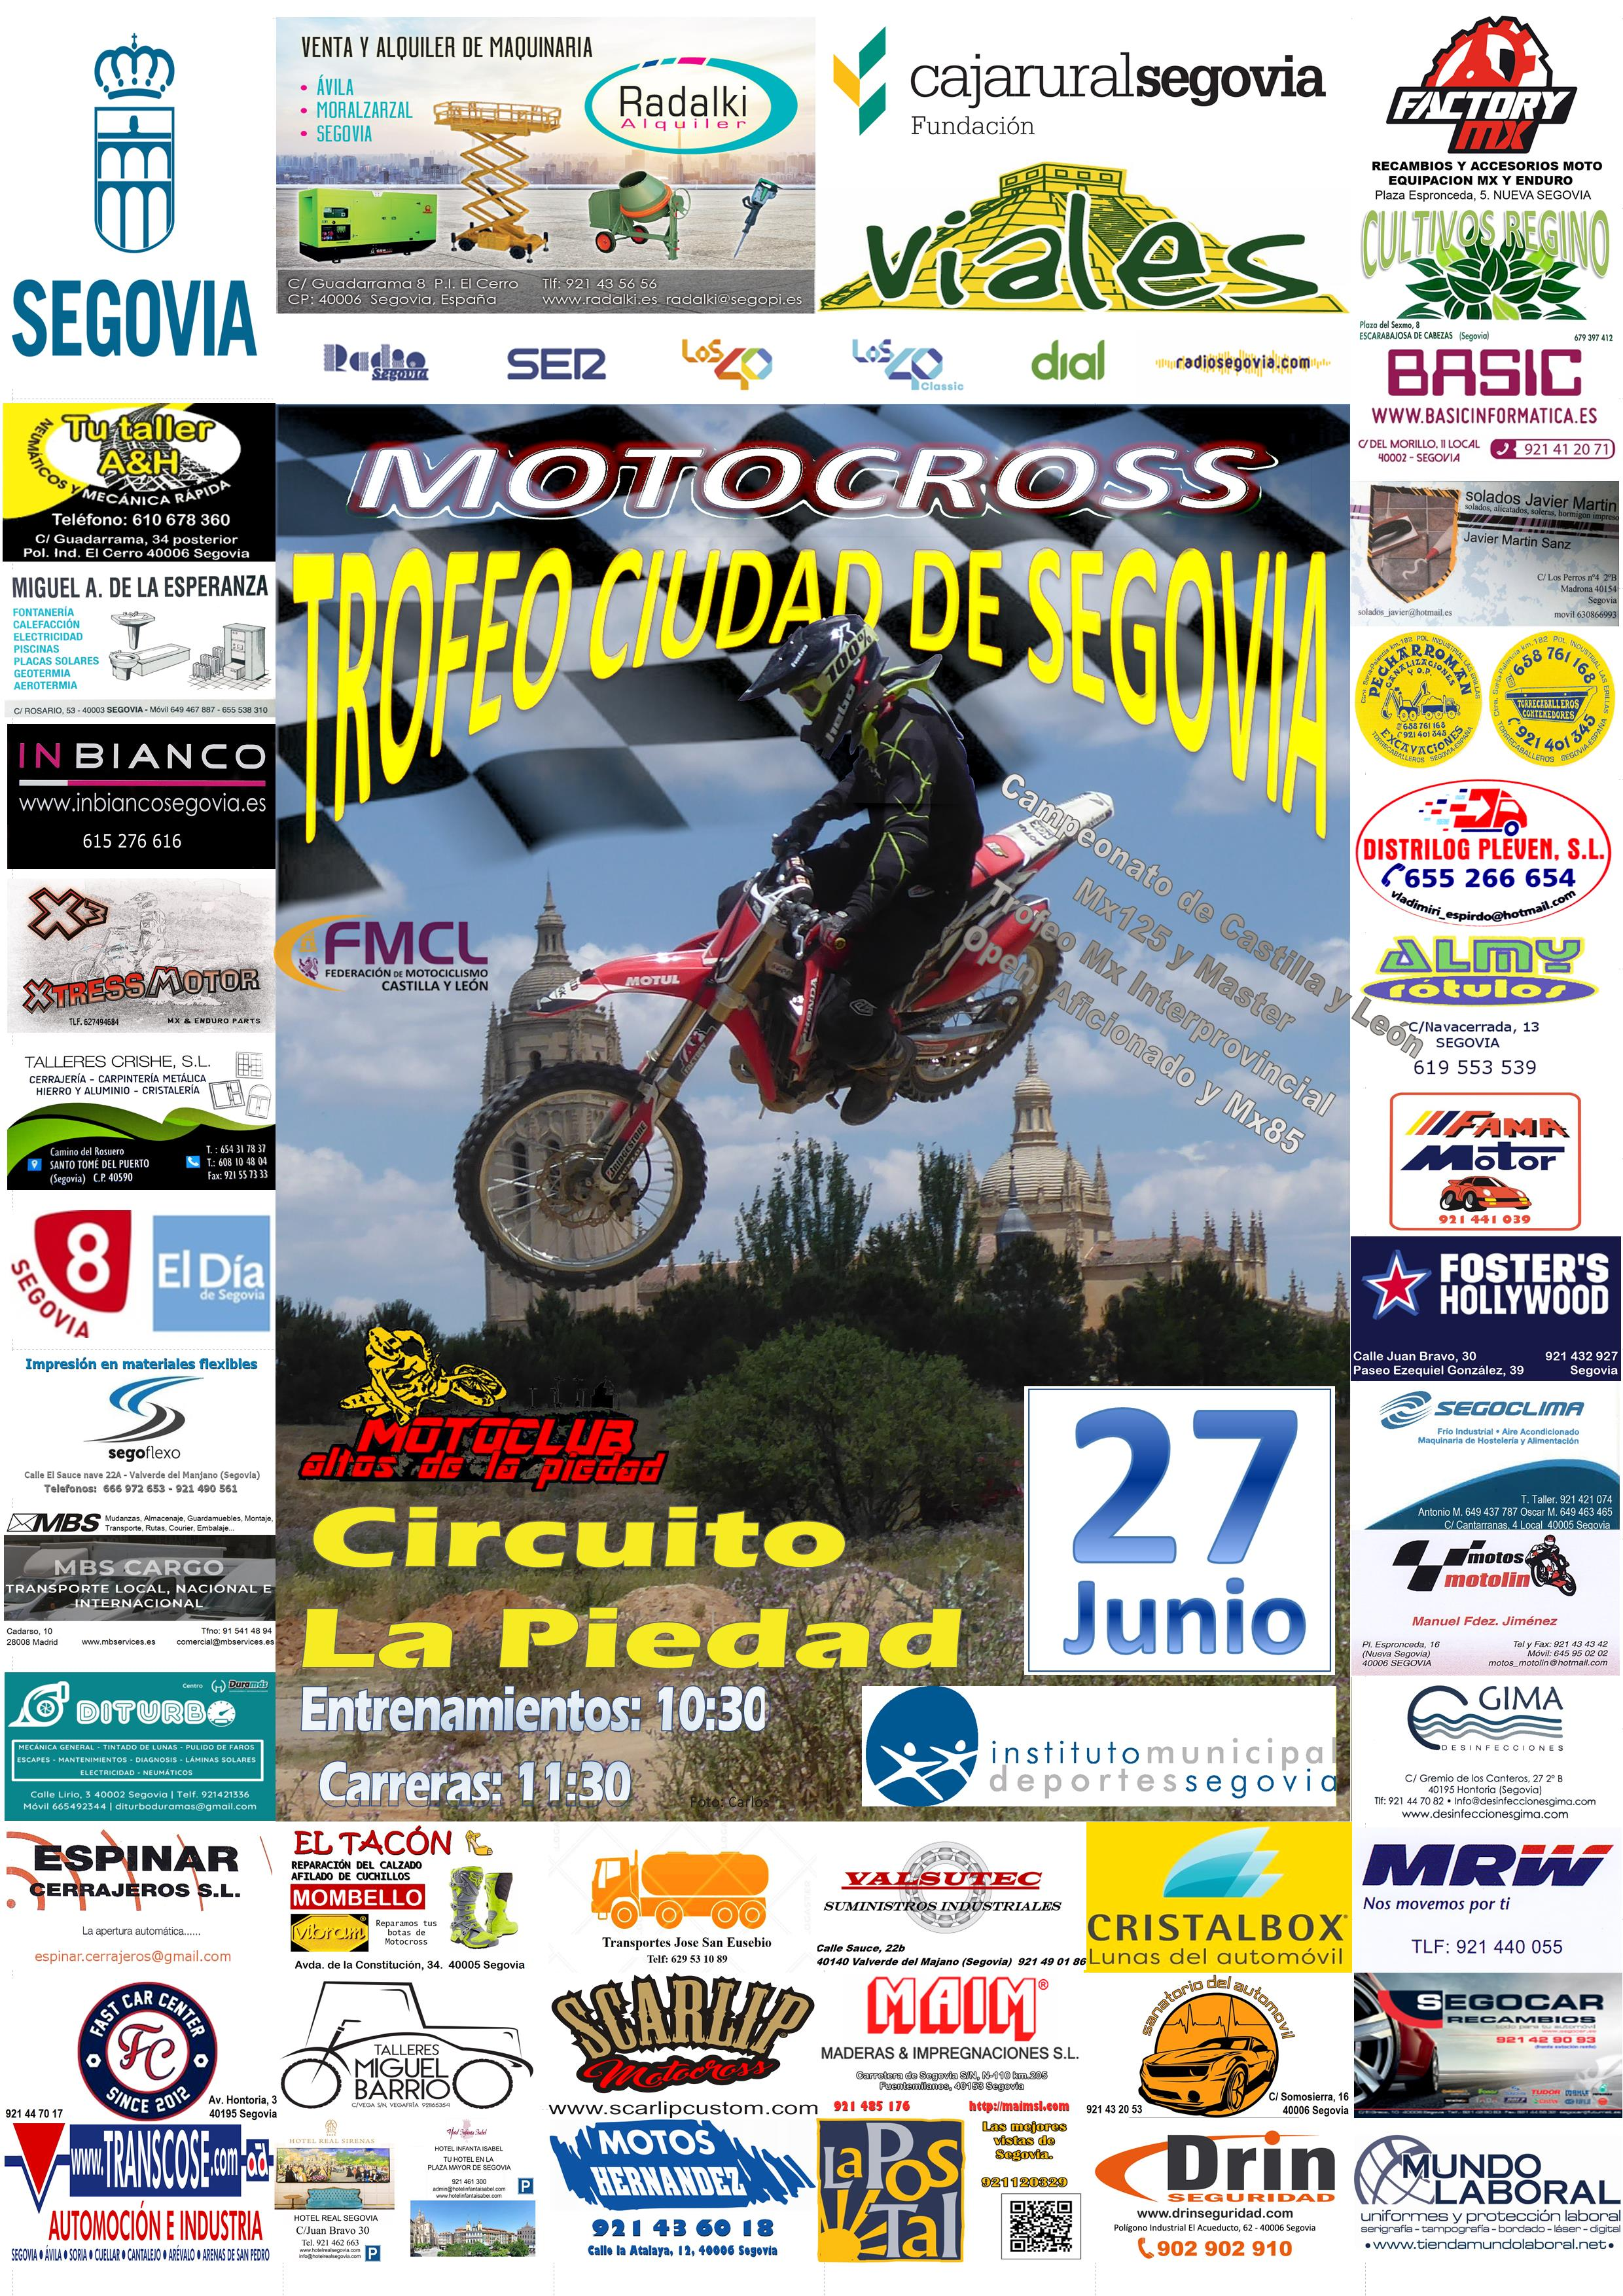 "Motocross IV Trofeo ""Ciudad de Segovia"""